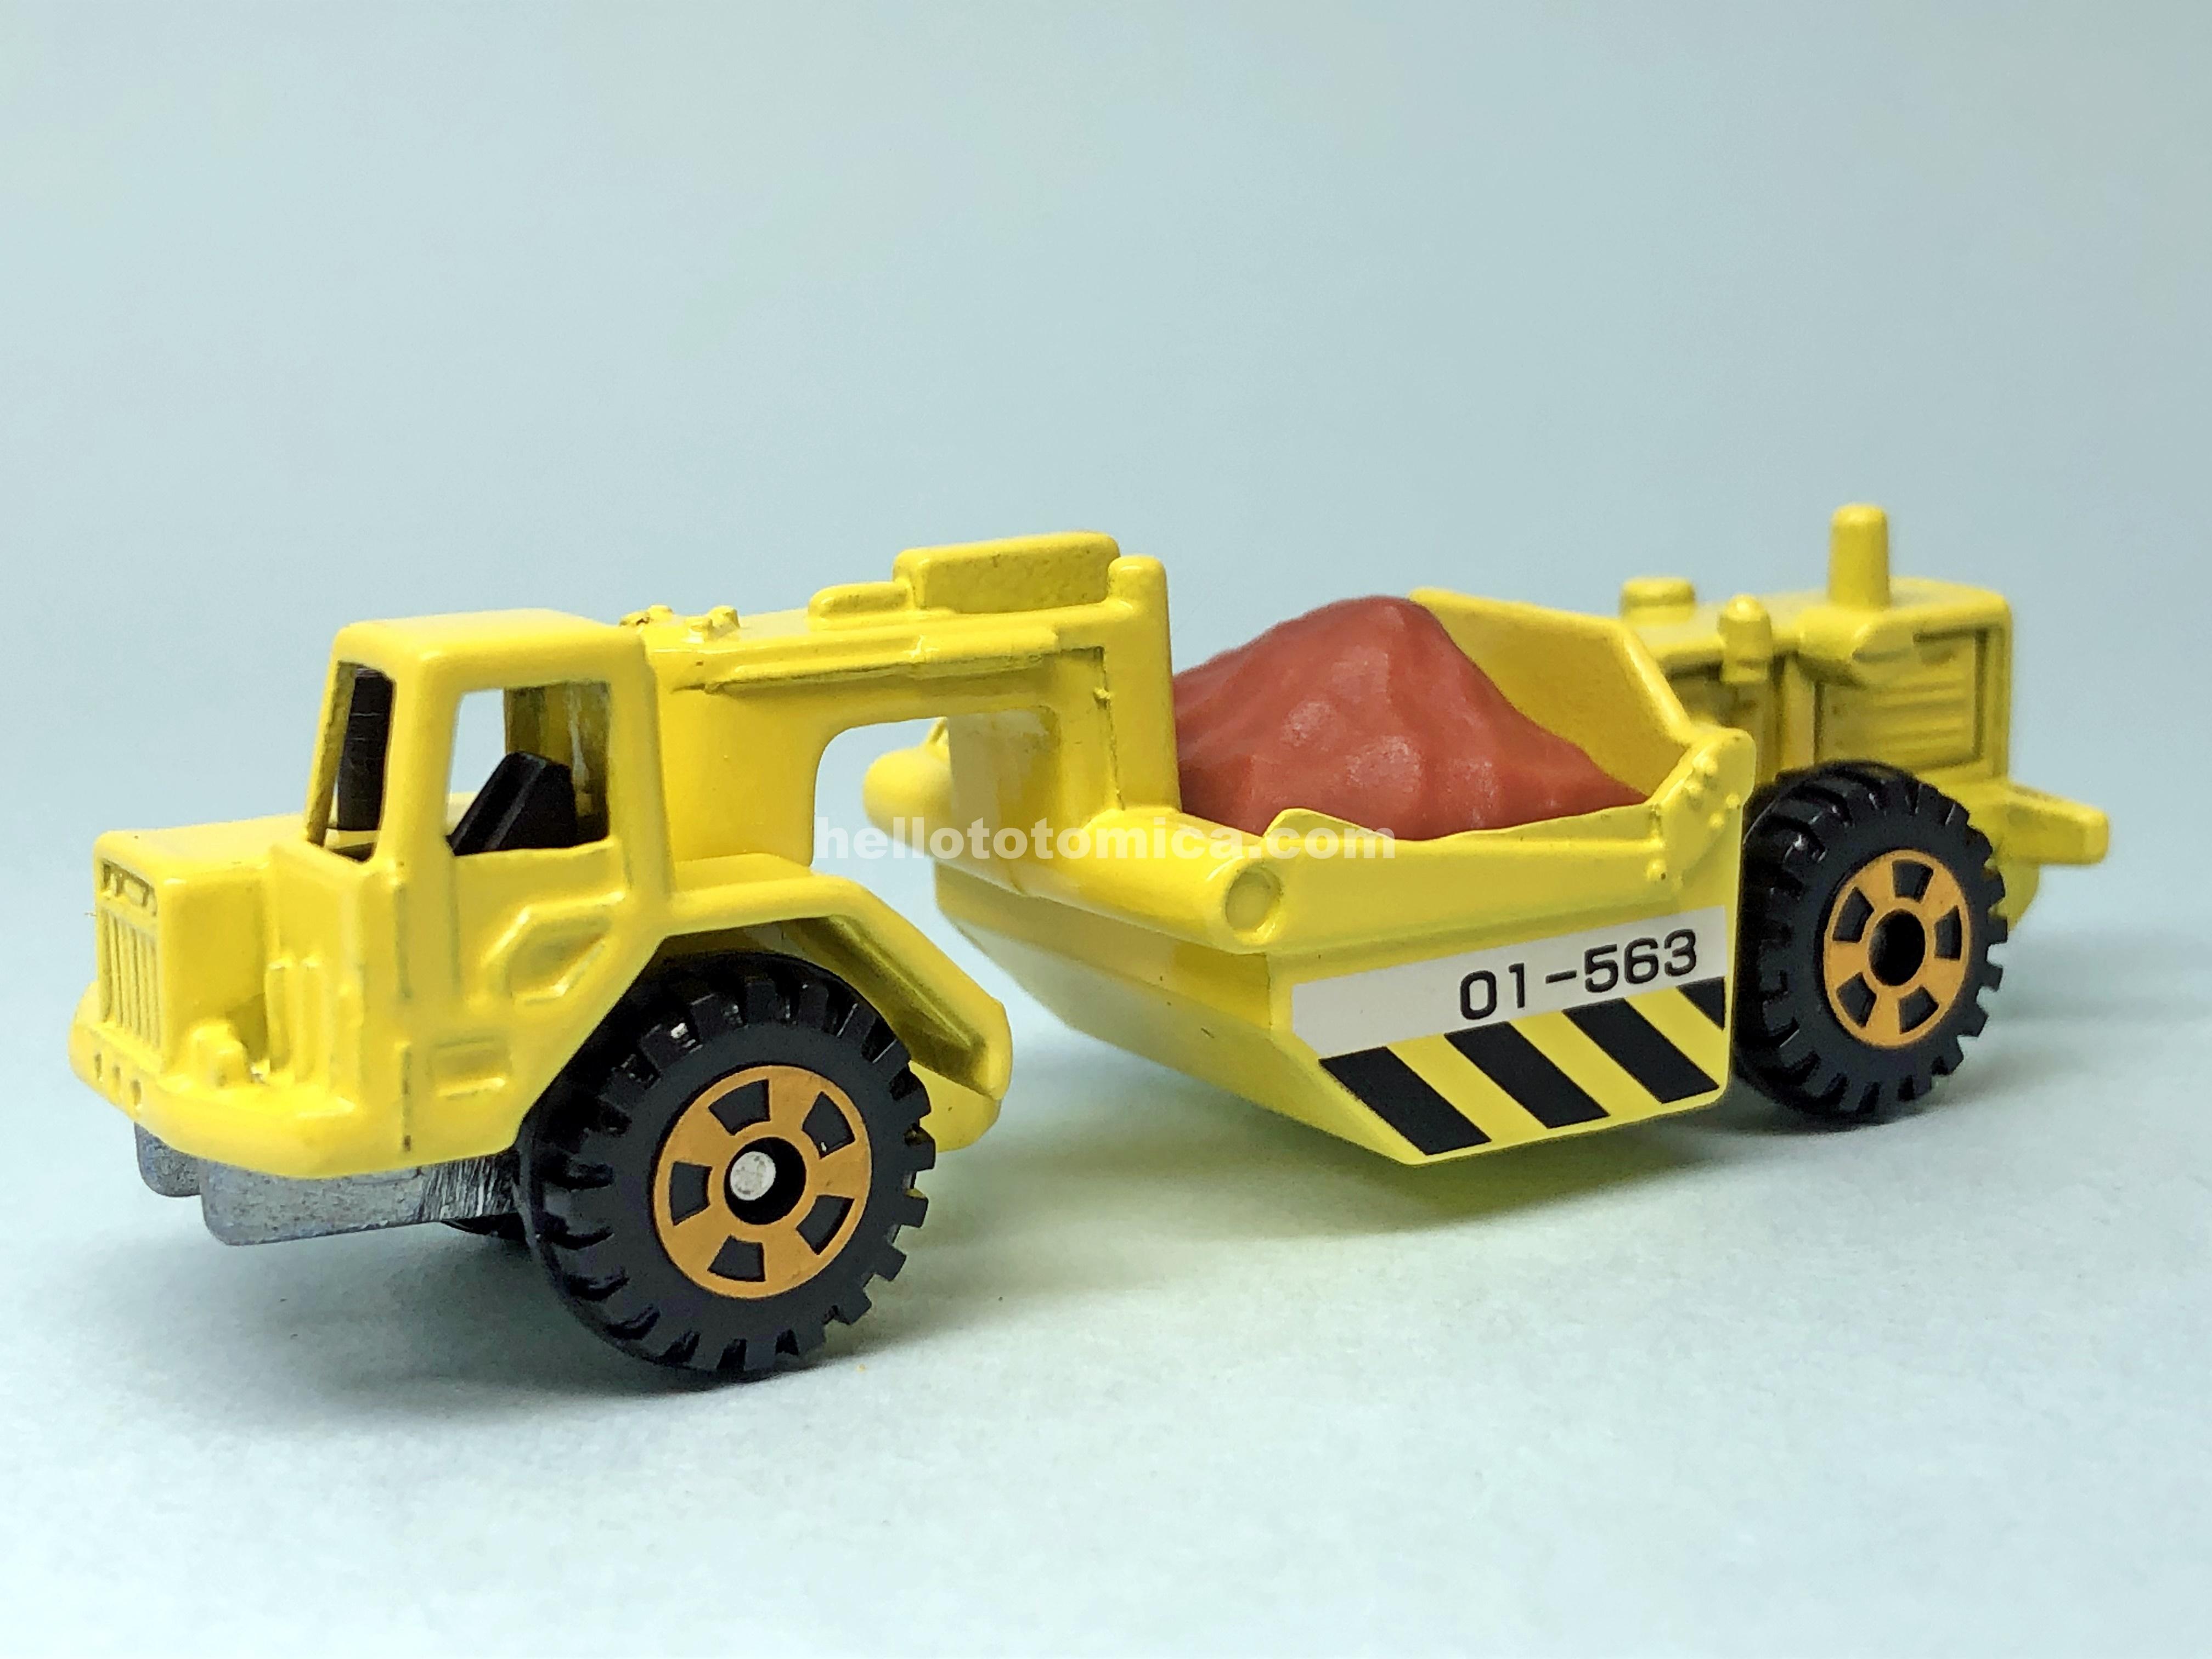 32-3 KOMATSU MOTOR SCRAPER WS16